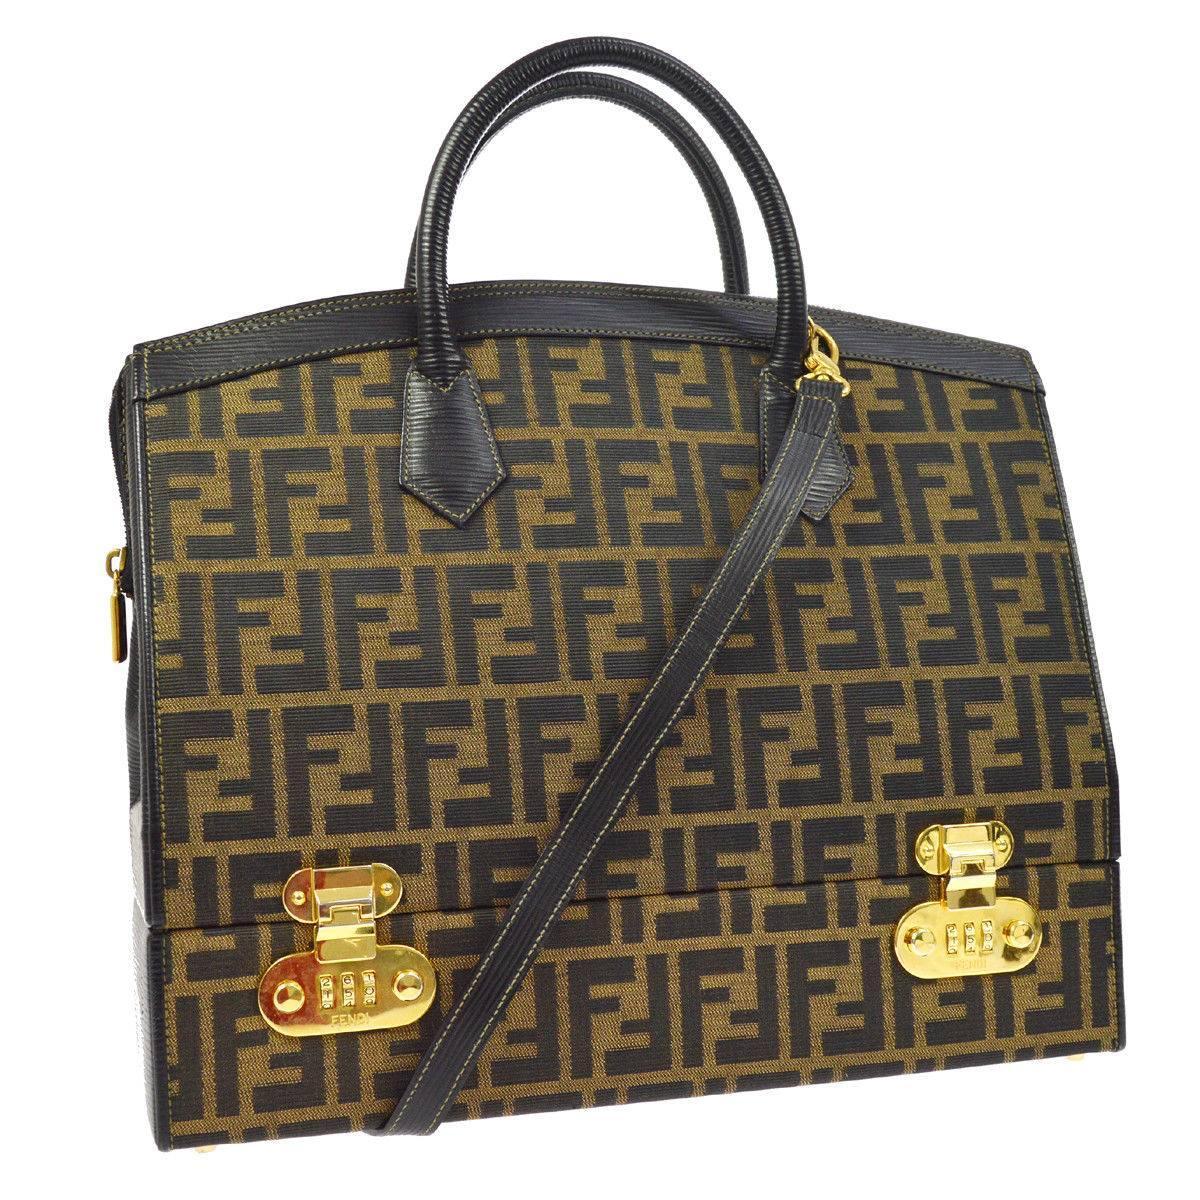 Fendi Monogram Canvas Travel Storage Vanity Jewelry Top Handle Satchel Bag h0RJeJz